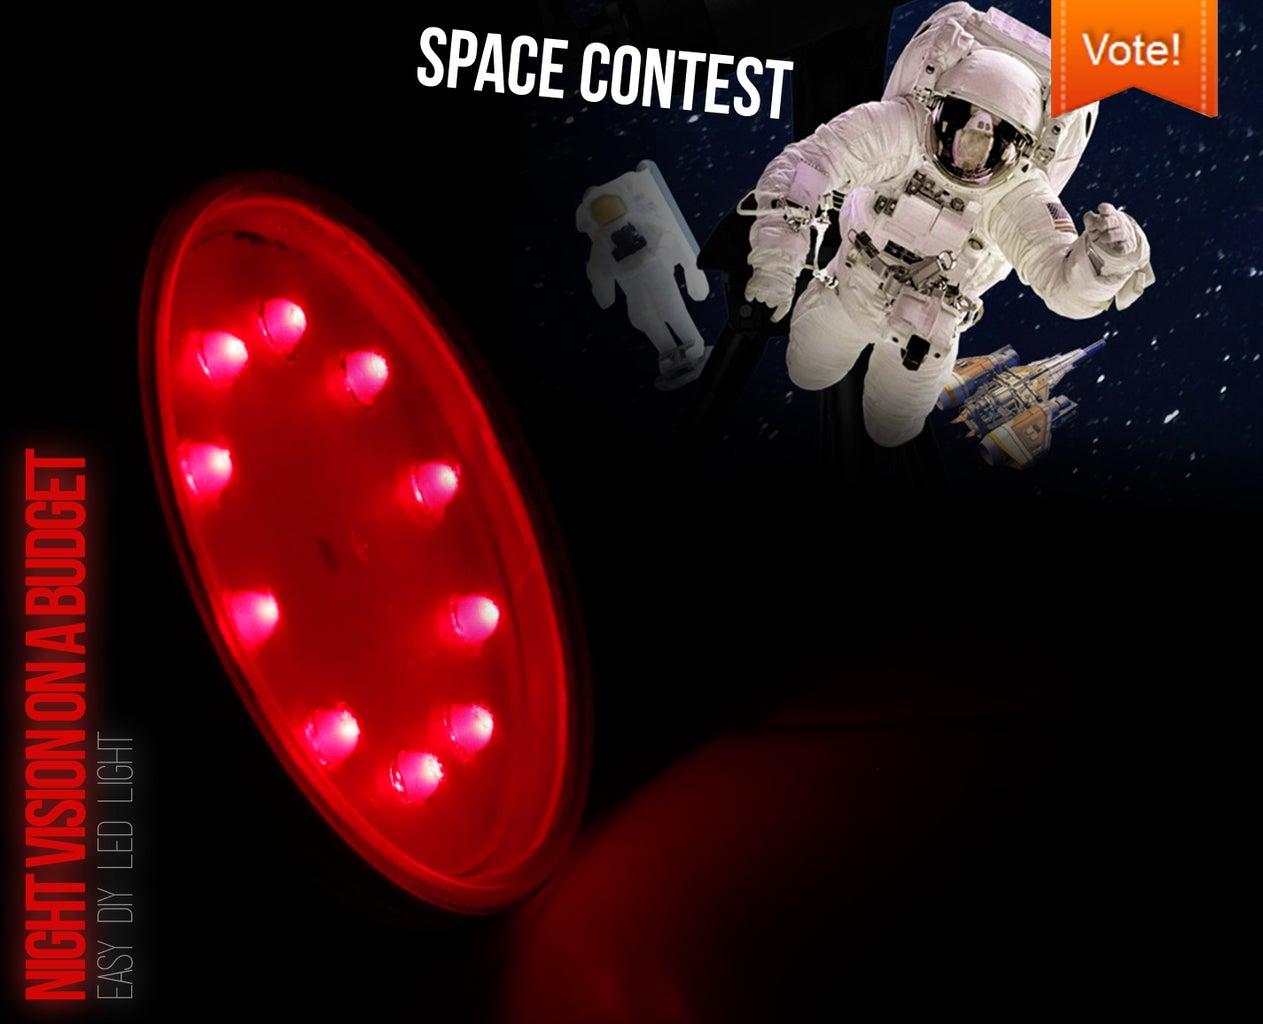 Space Contest